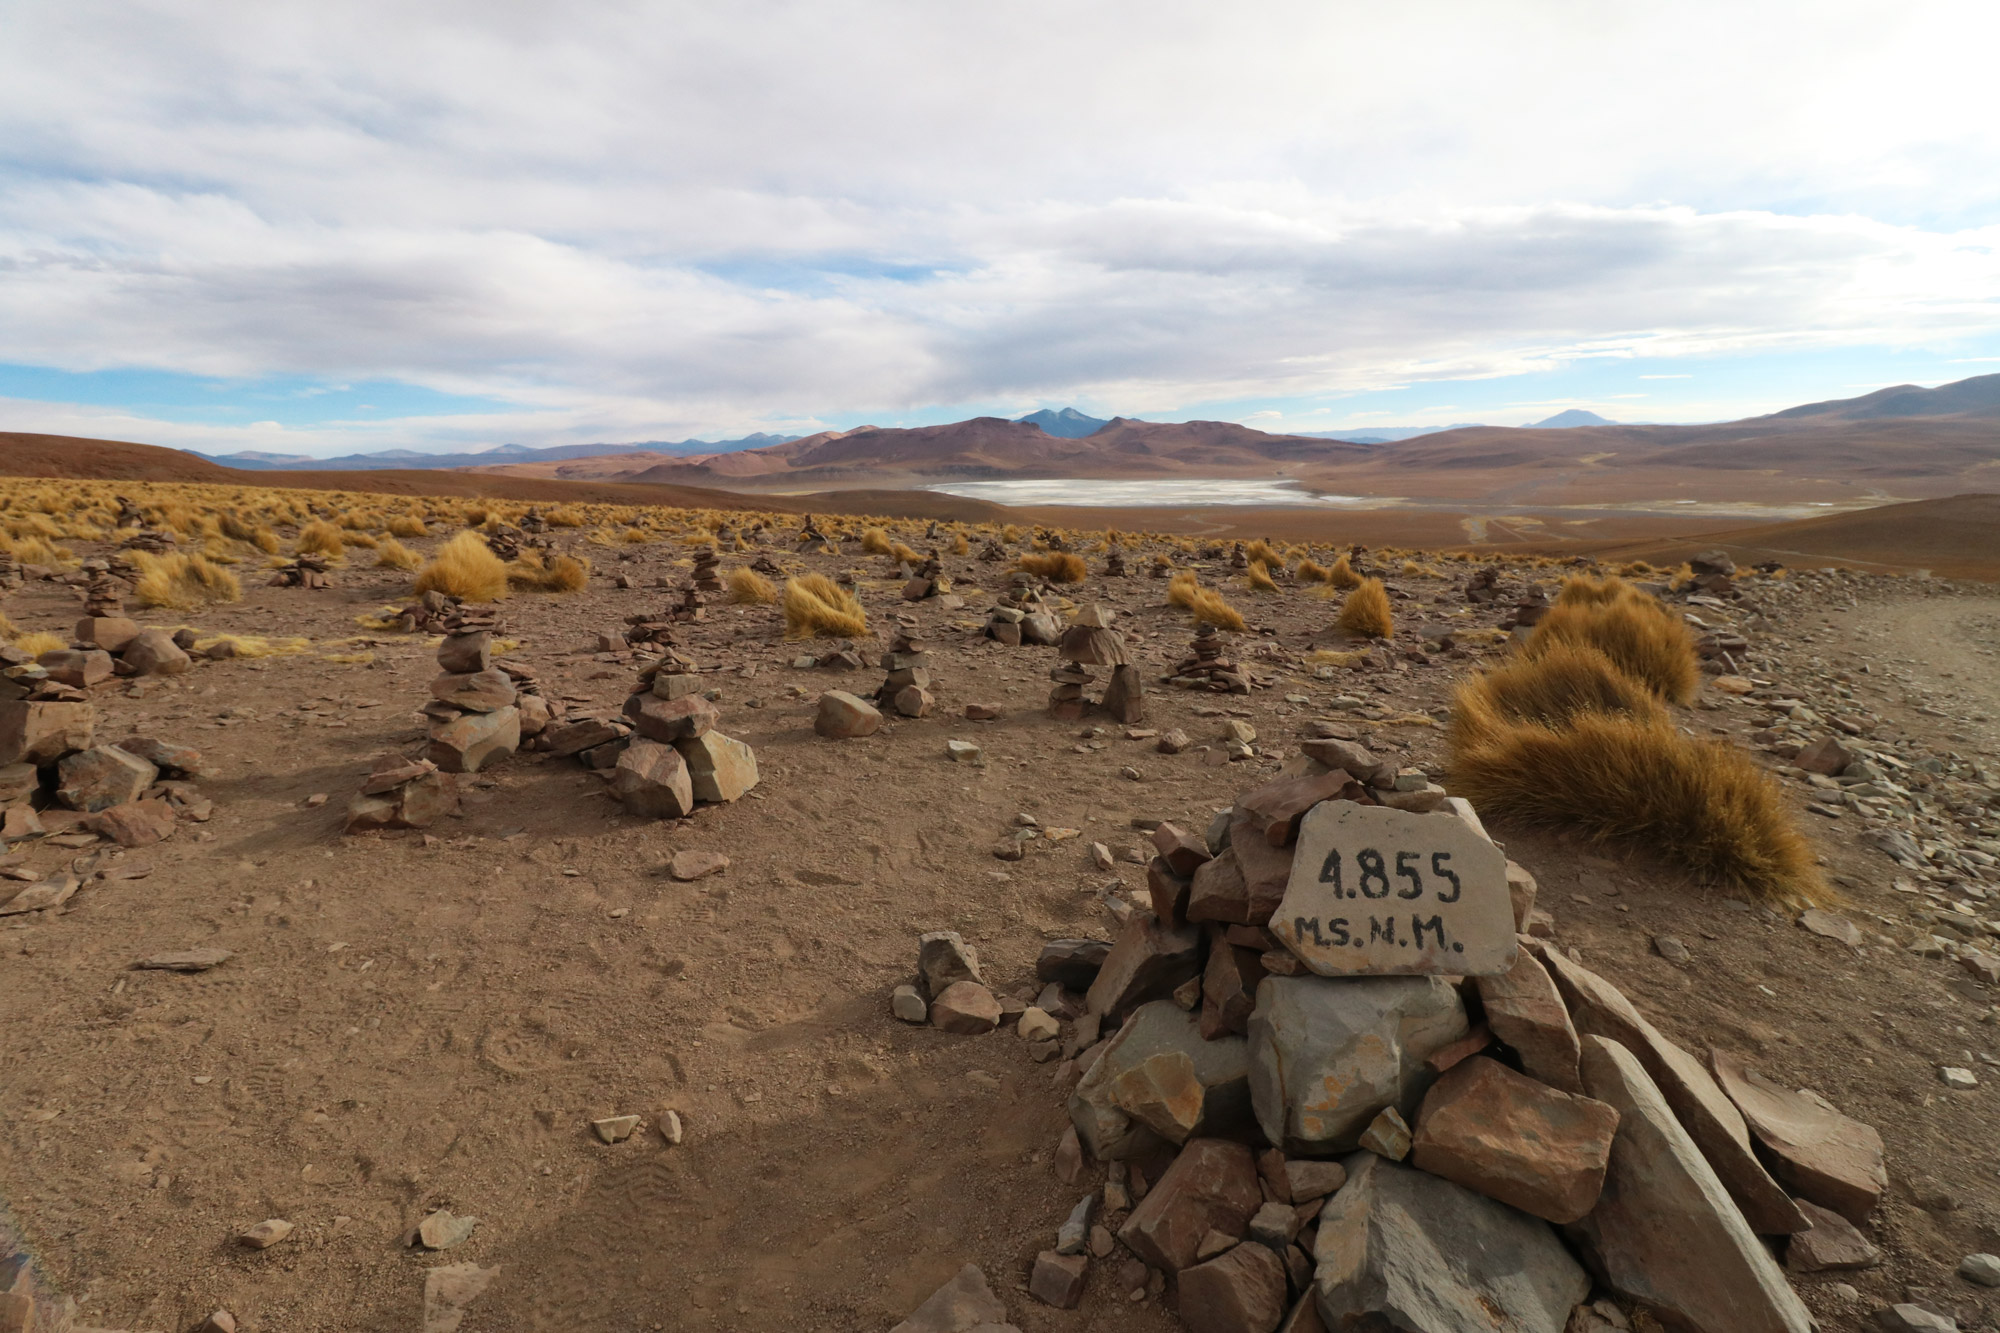 Reisverslag Bolivia: Four Days Of Fantasy Tour - Morejon